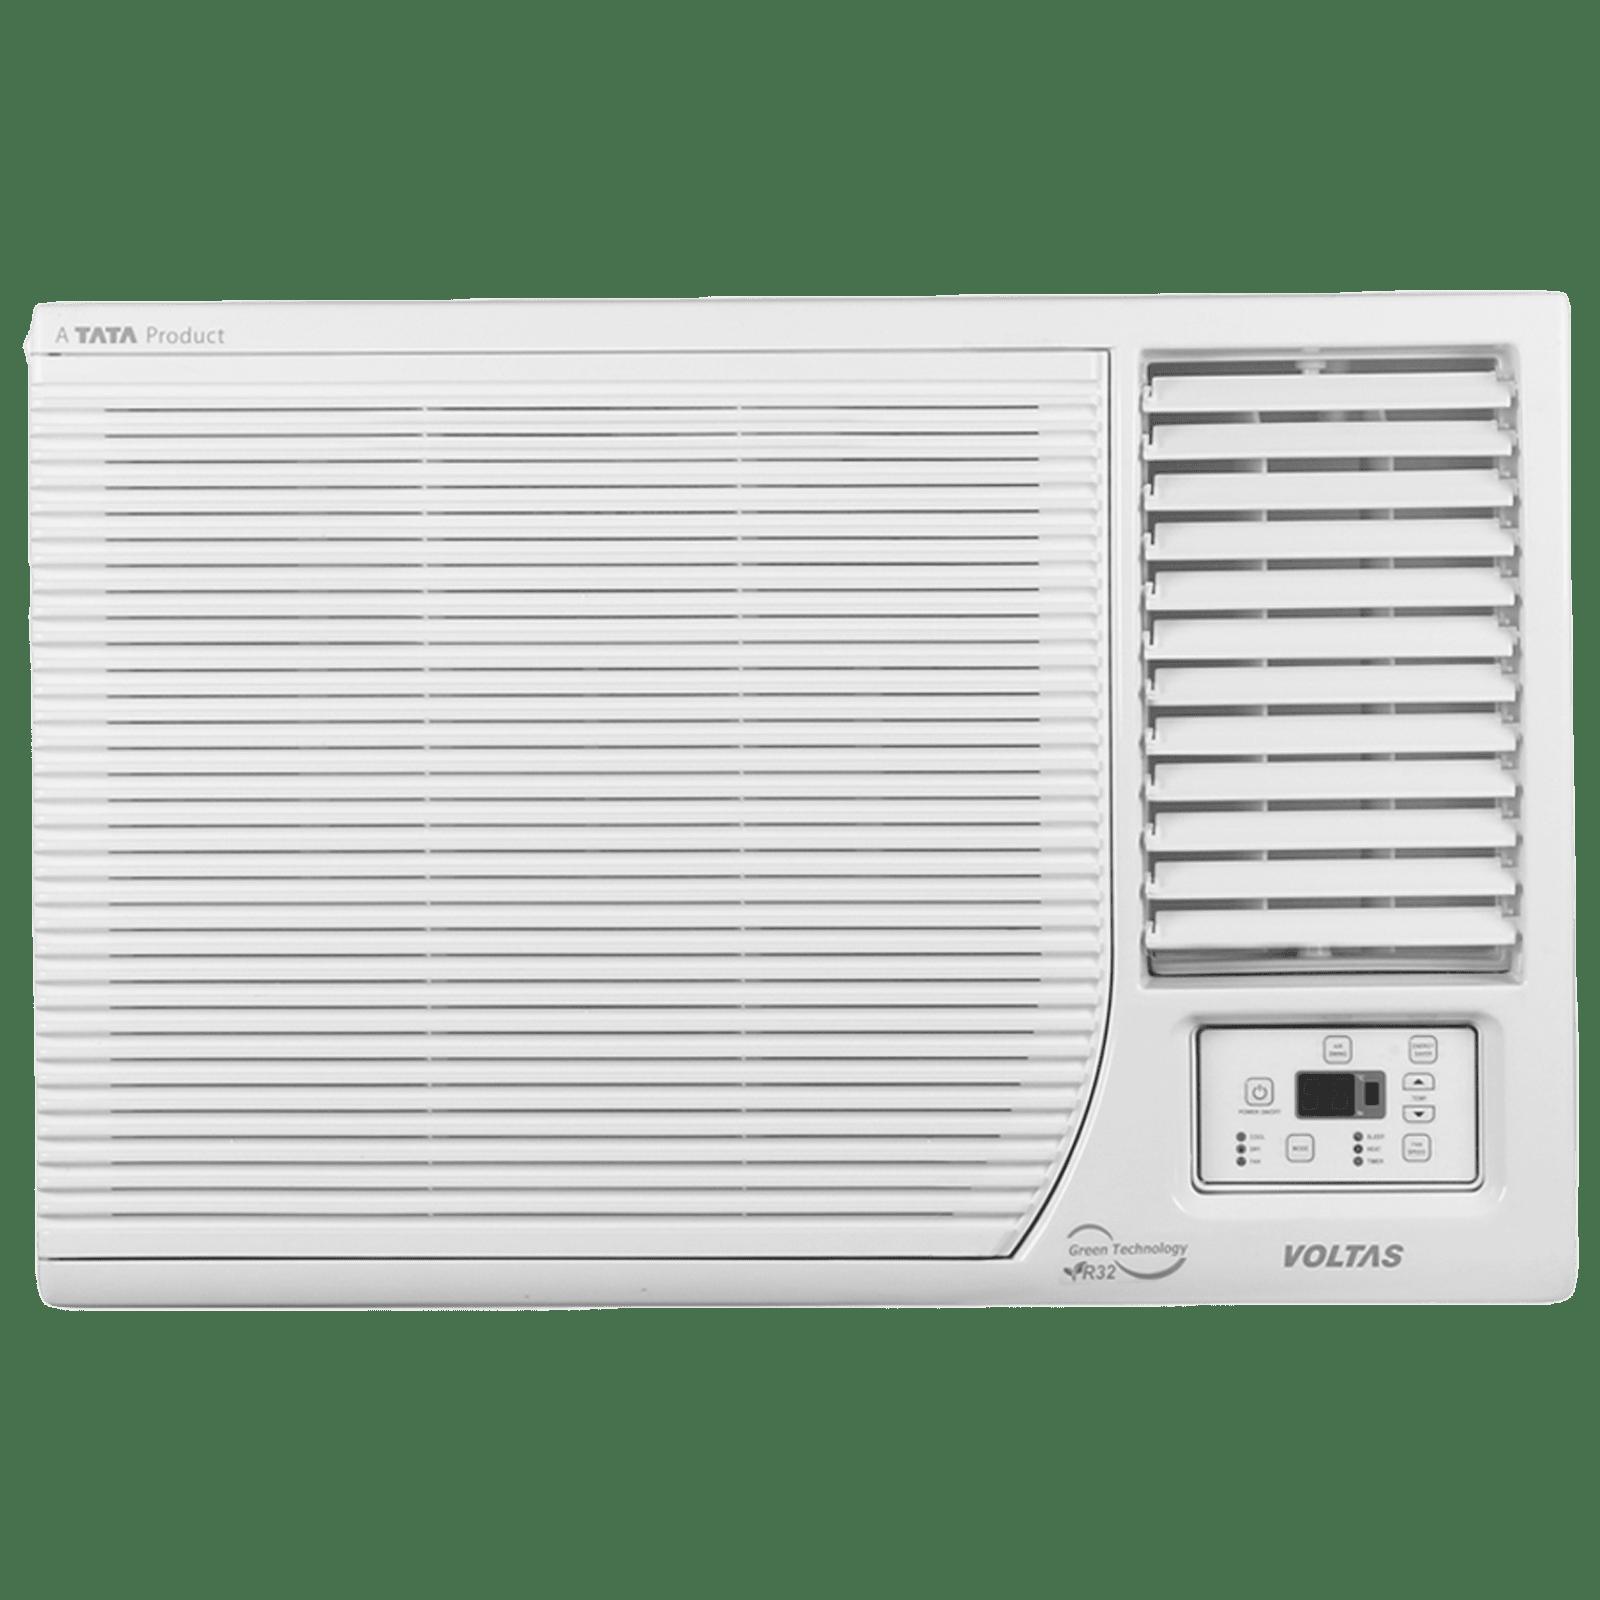 Voltas 1.5 Ton 3 Star Inverter Window AC (Hot and Cold, Copper Condenser, 18H DZB, White)